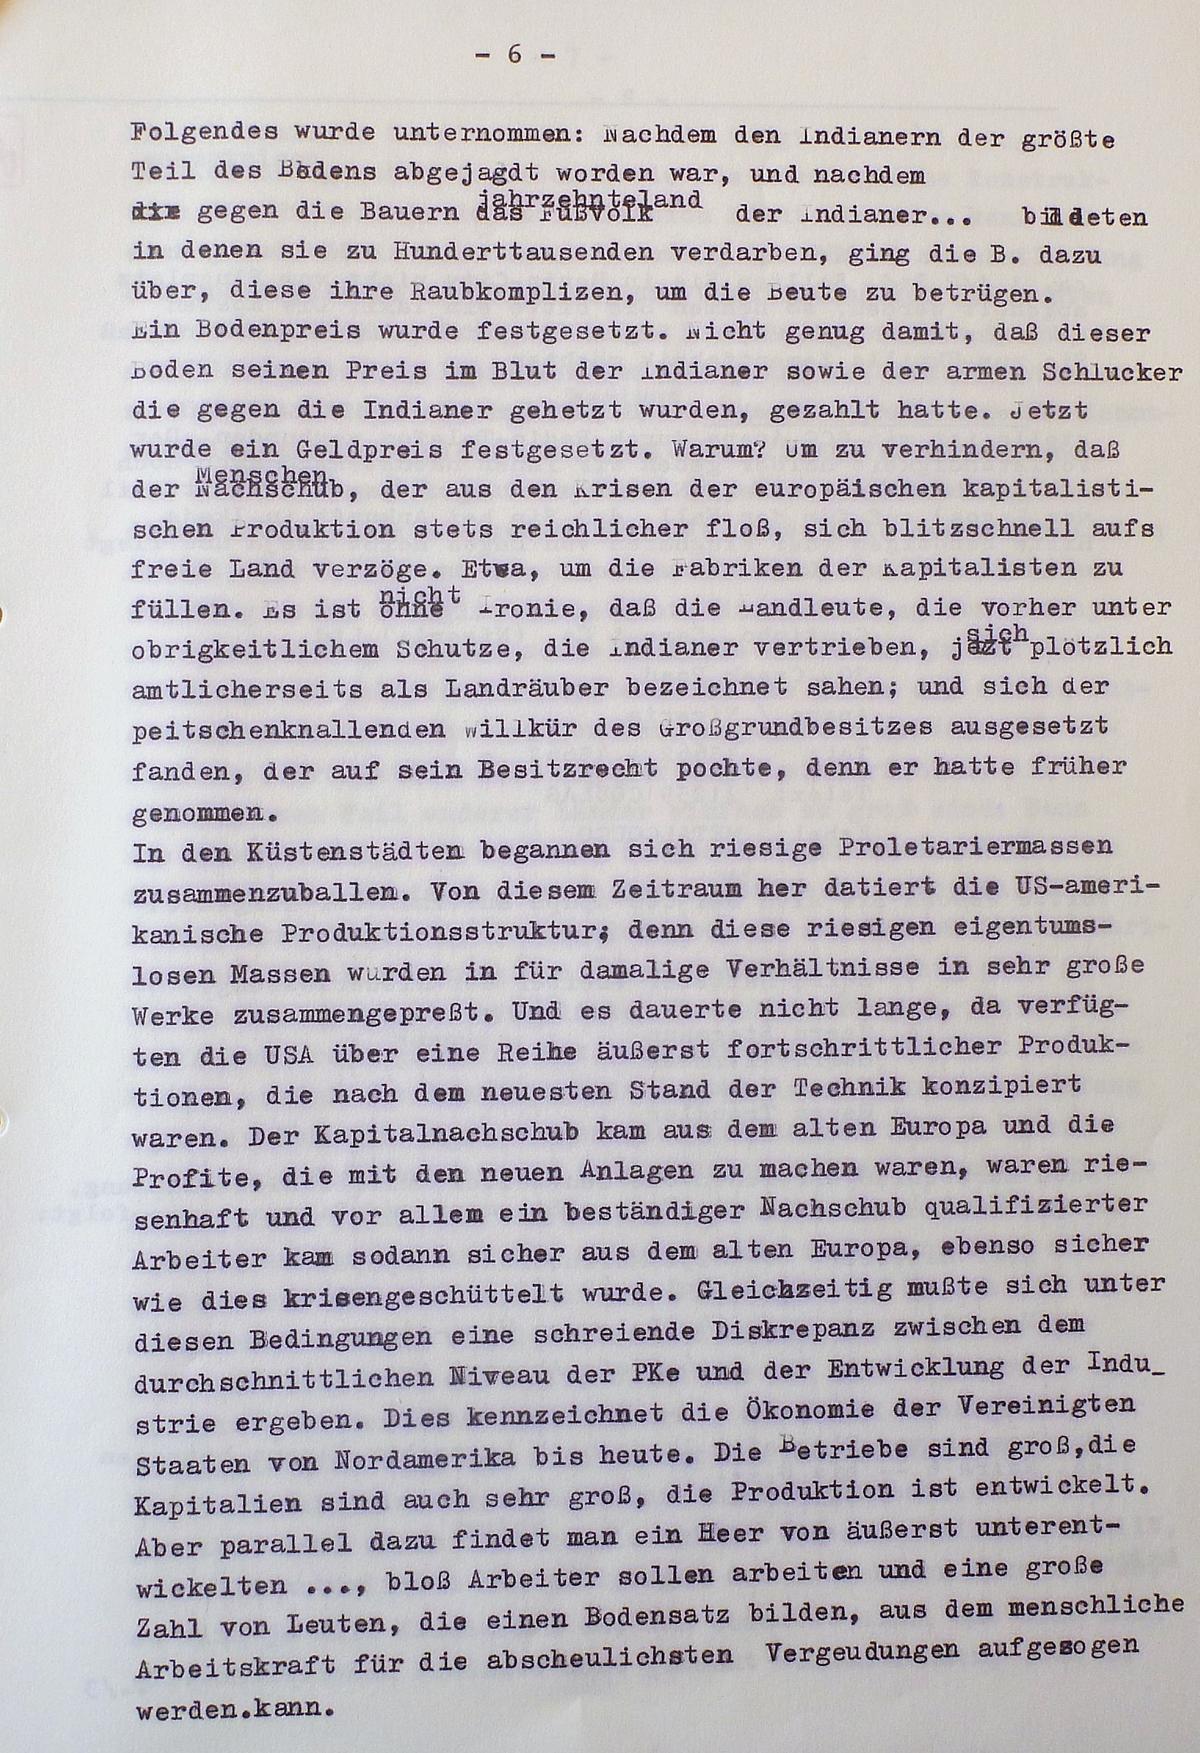 Hamburg_KBW_1978_Fochler006